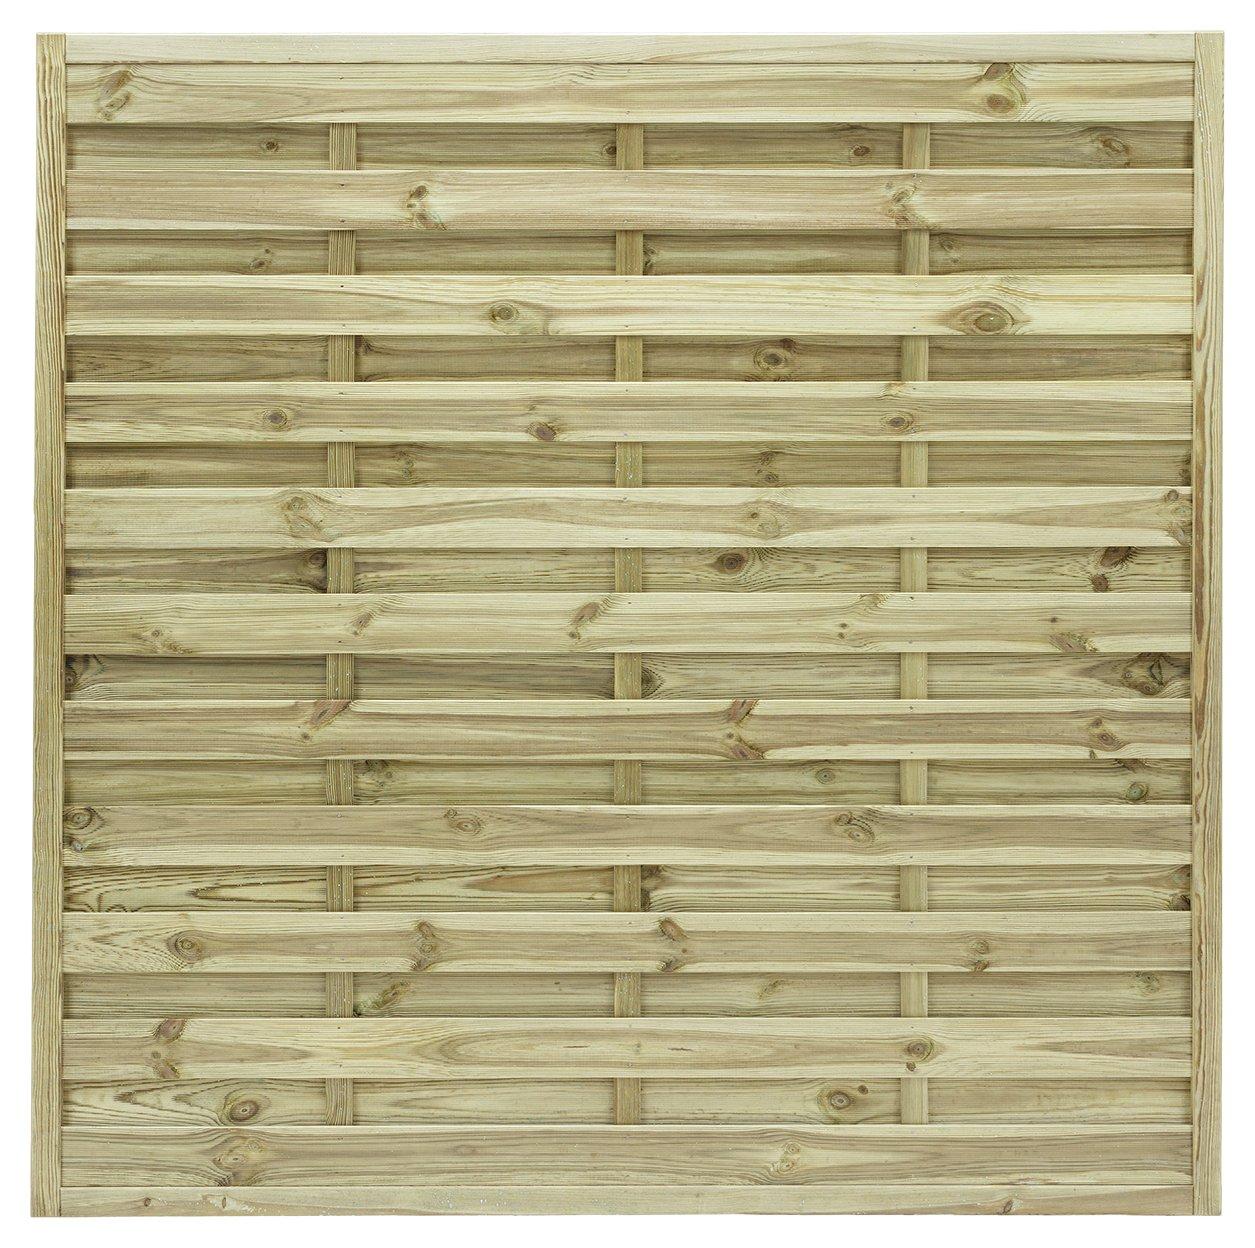 Grange 1.8m St Espirit Square Fence Panel - Pack of 5. lowest price